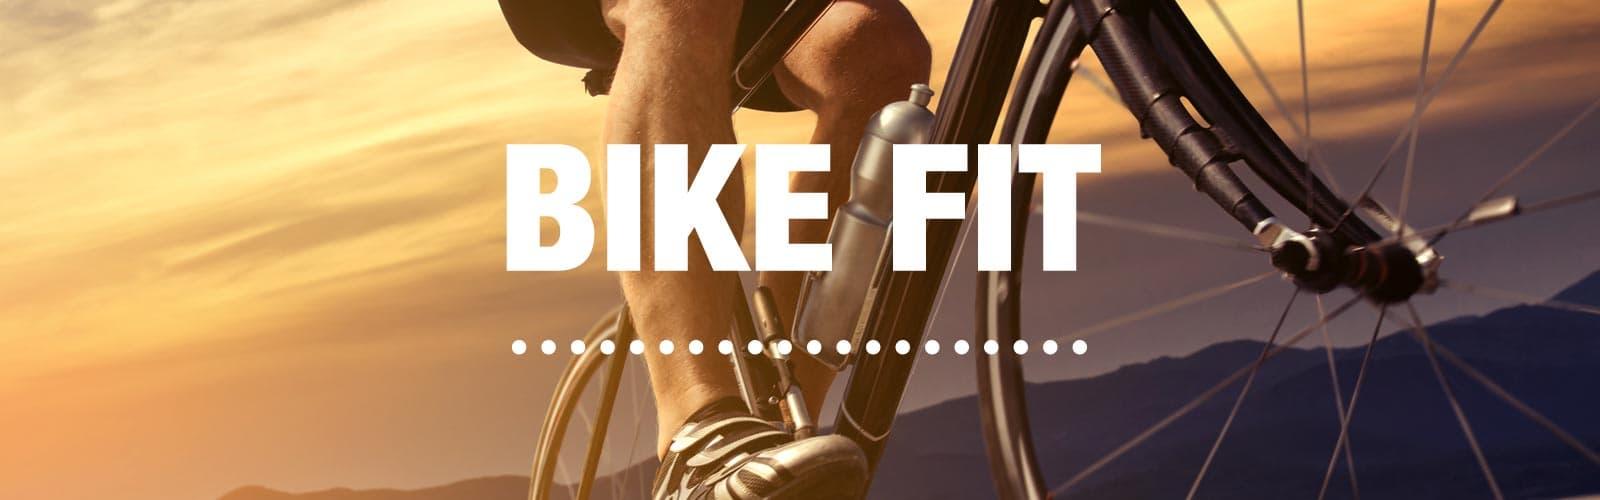 Bike Fit Guide